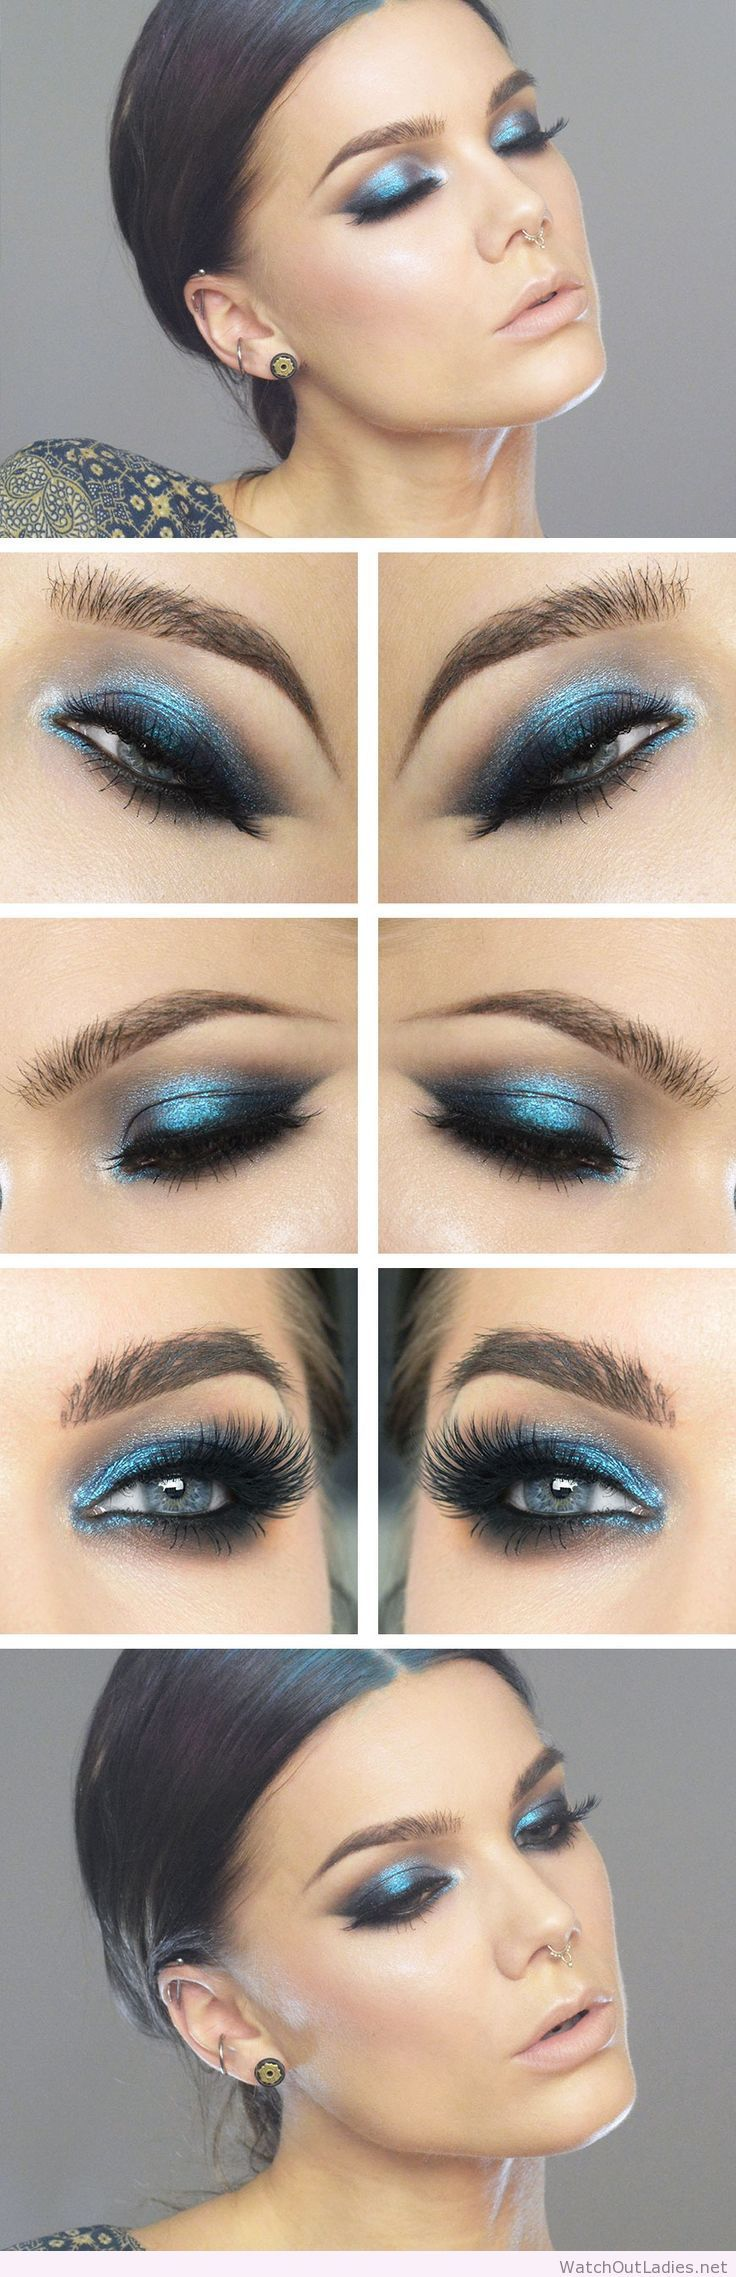 Linda Hallberg awesome blue eye makeup with glitter